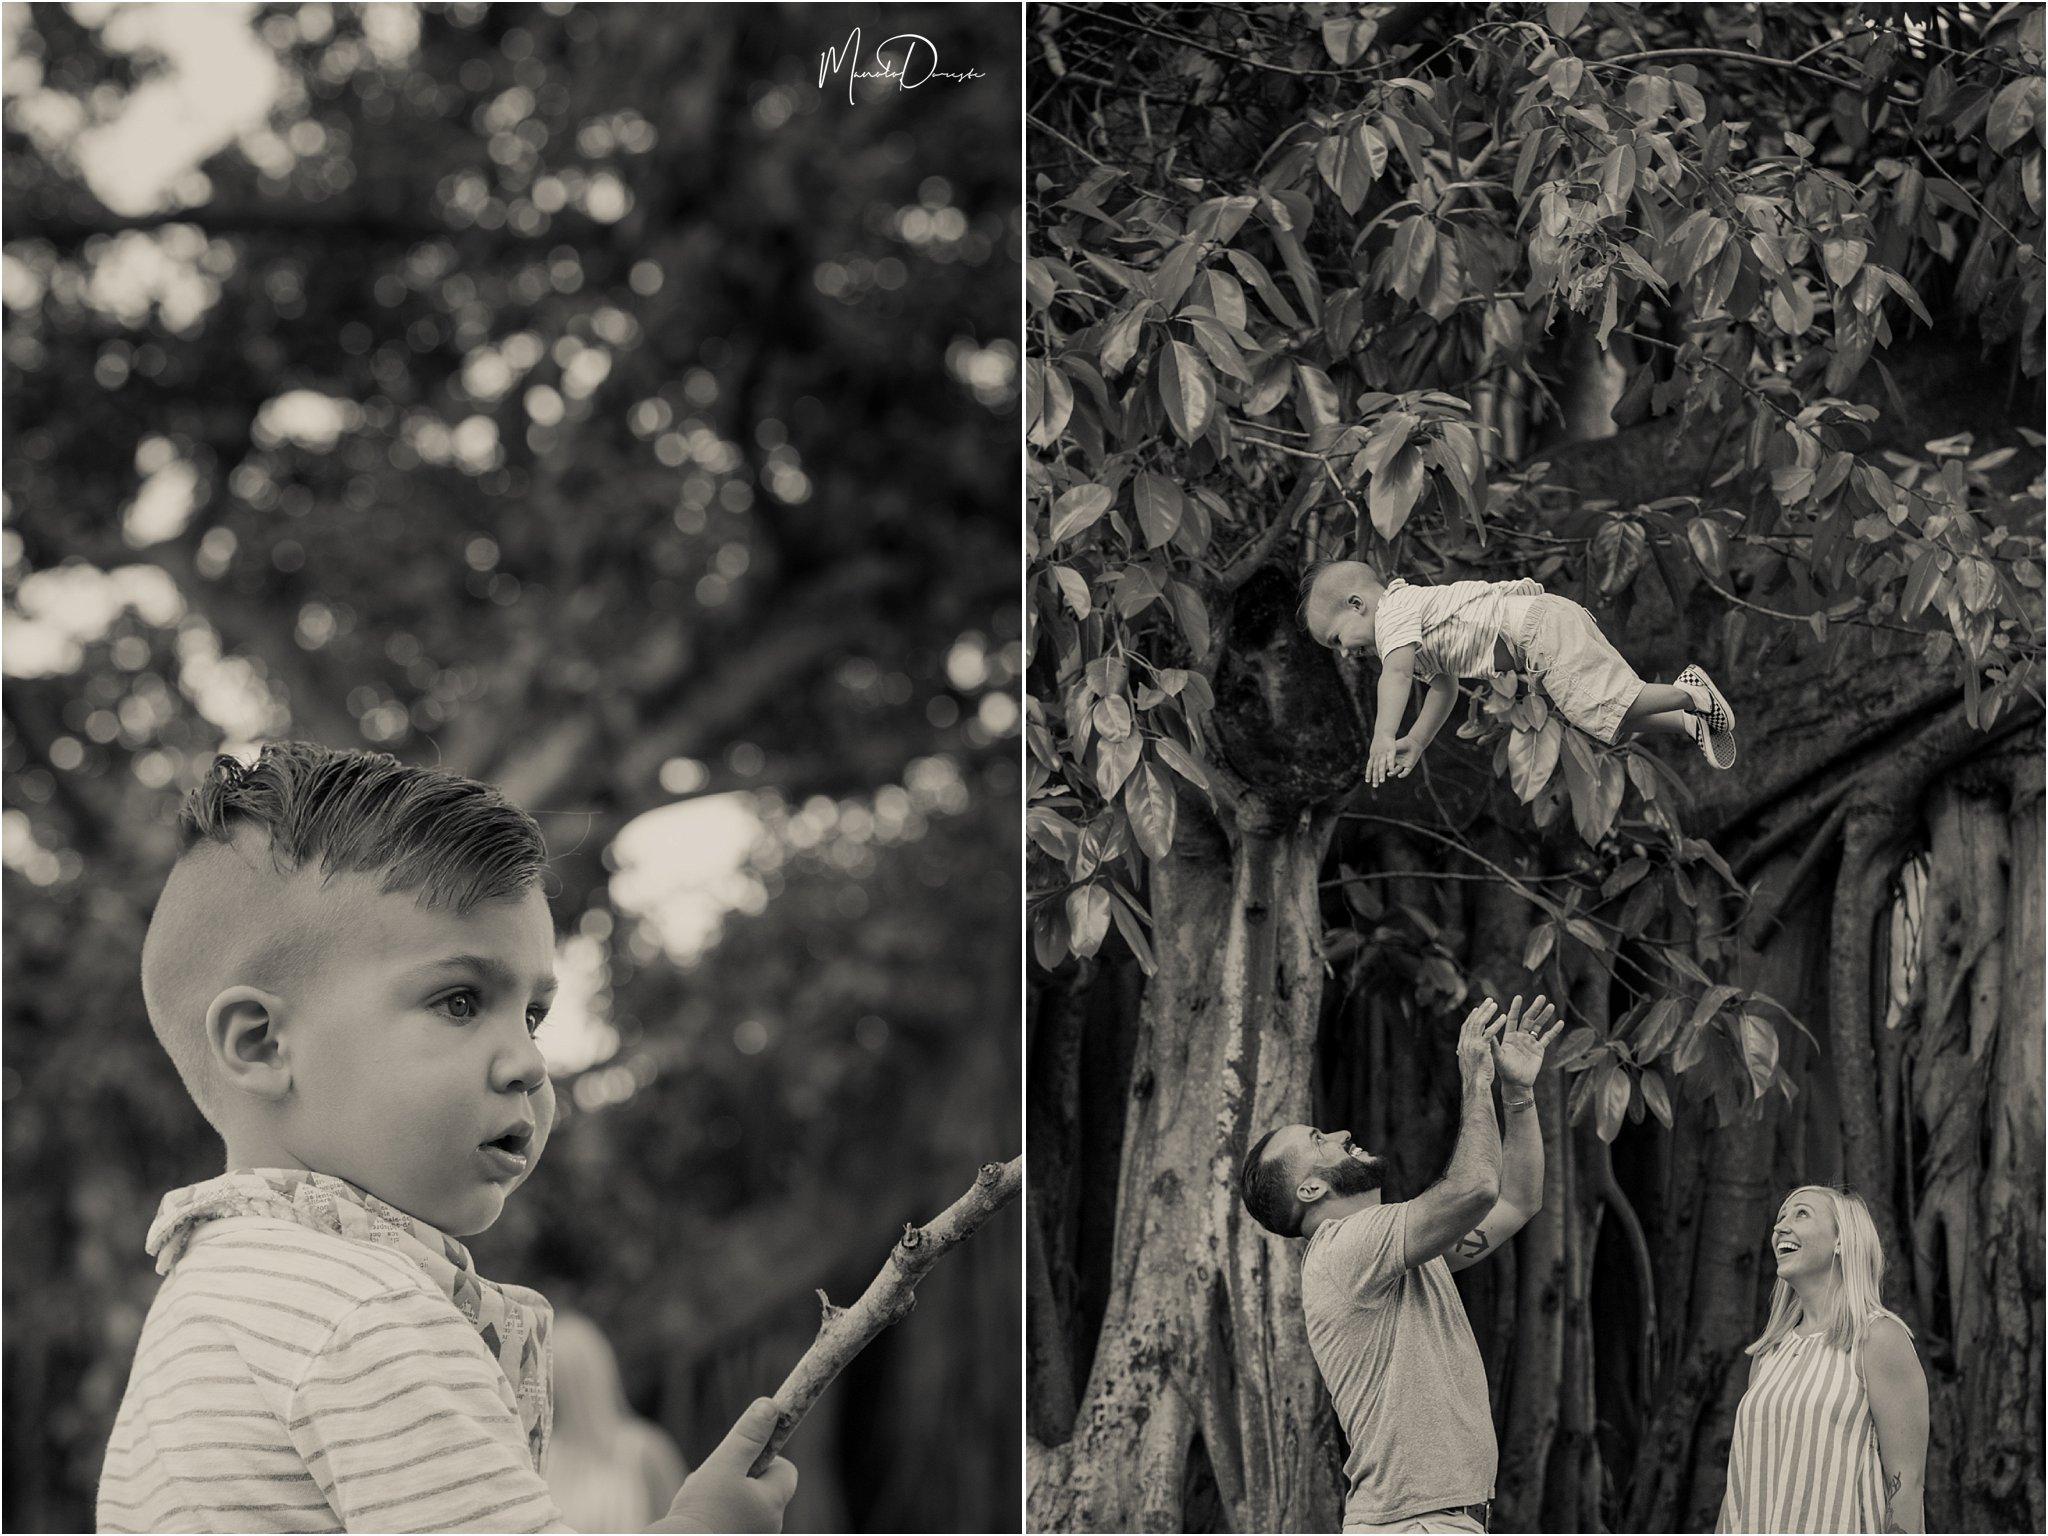 0211_ManoloDoreste_InFocusStudios_Wedding_Family_Photography_Miami_MiamiPhotographer.jpg